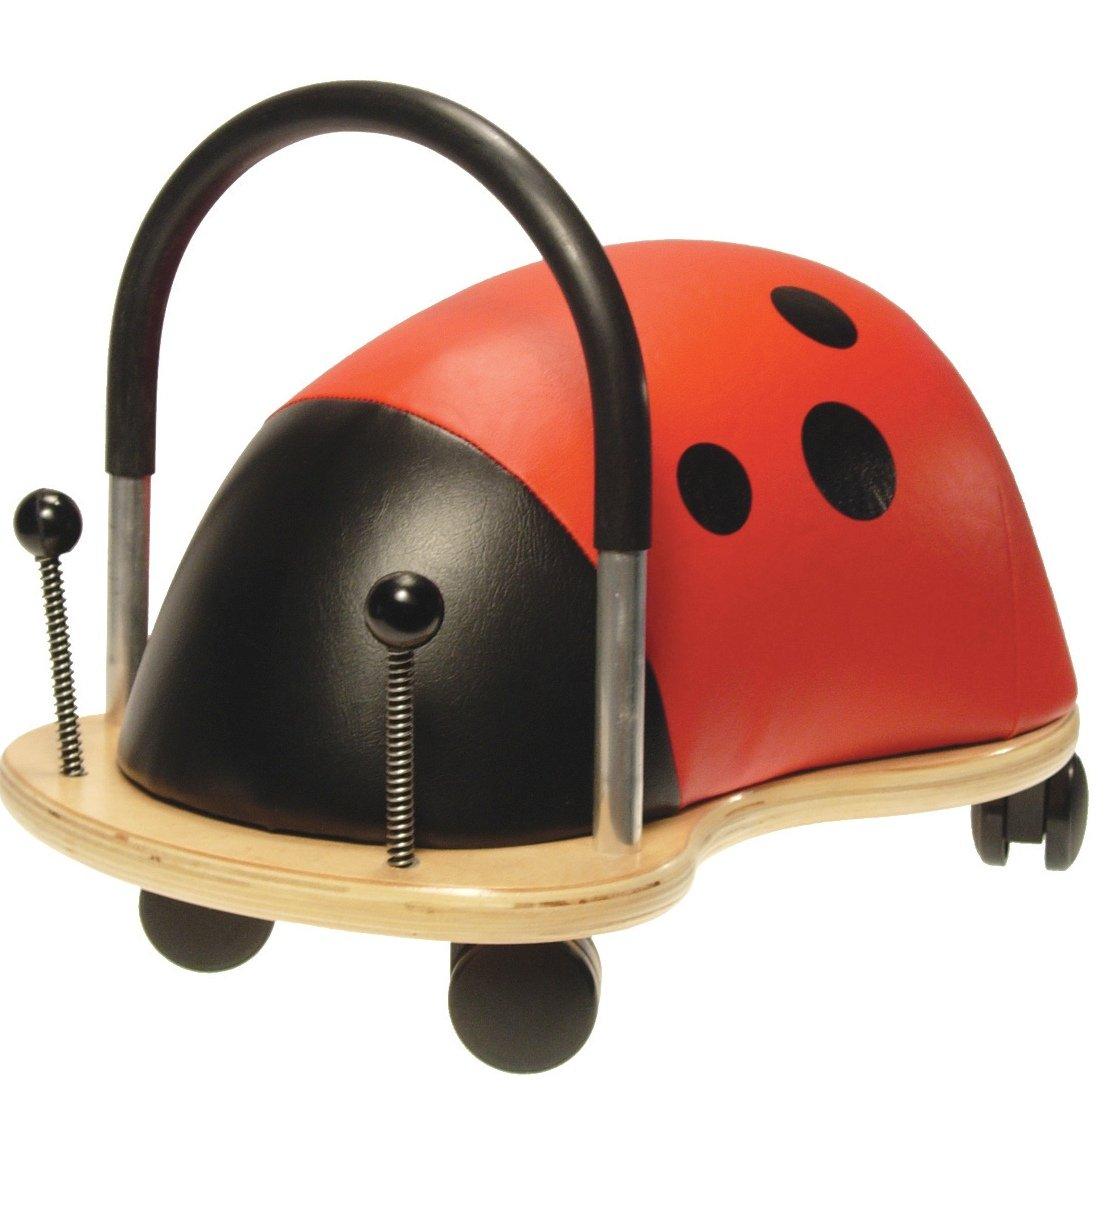 Prince Lionheart Wheely Bug, Ladybug, Small by Prince Lionheart